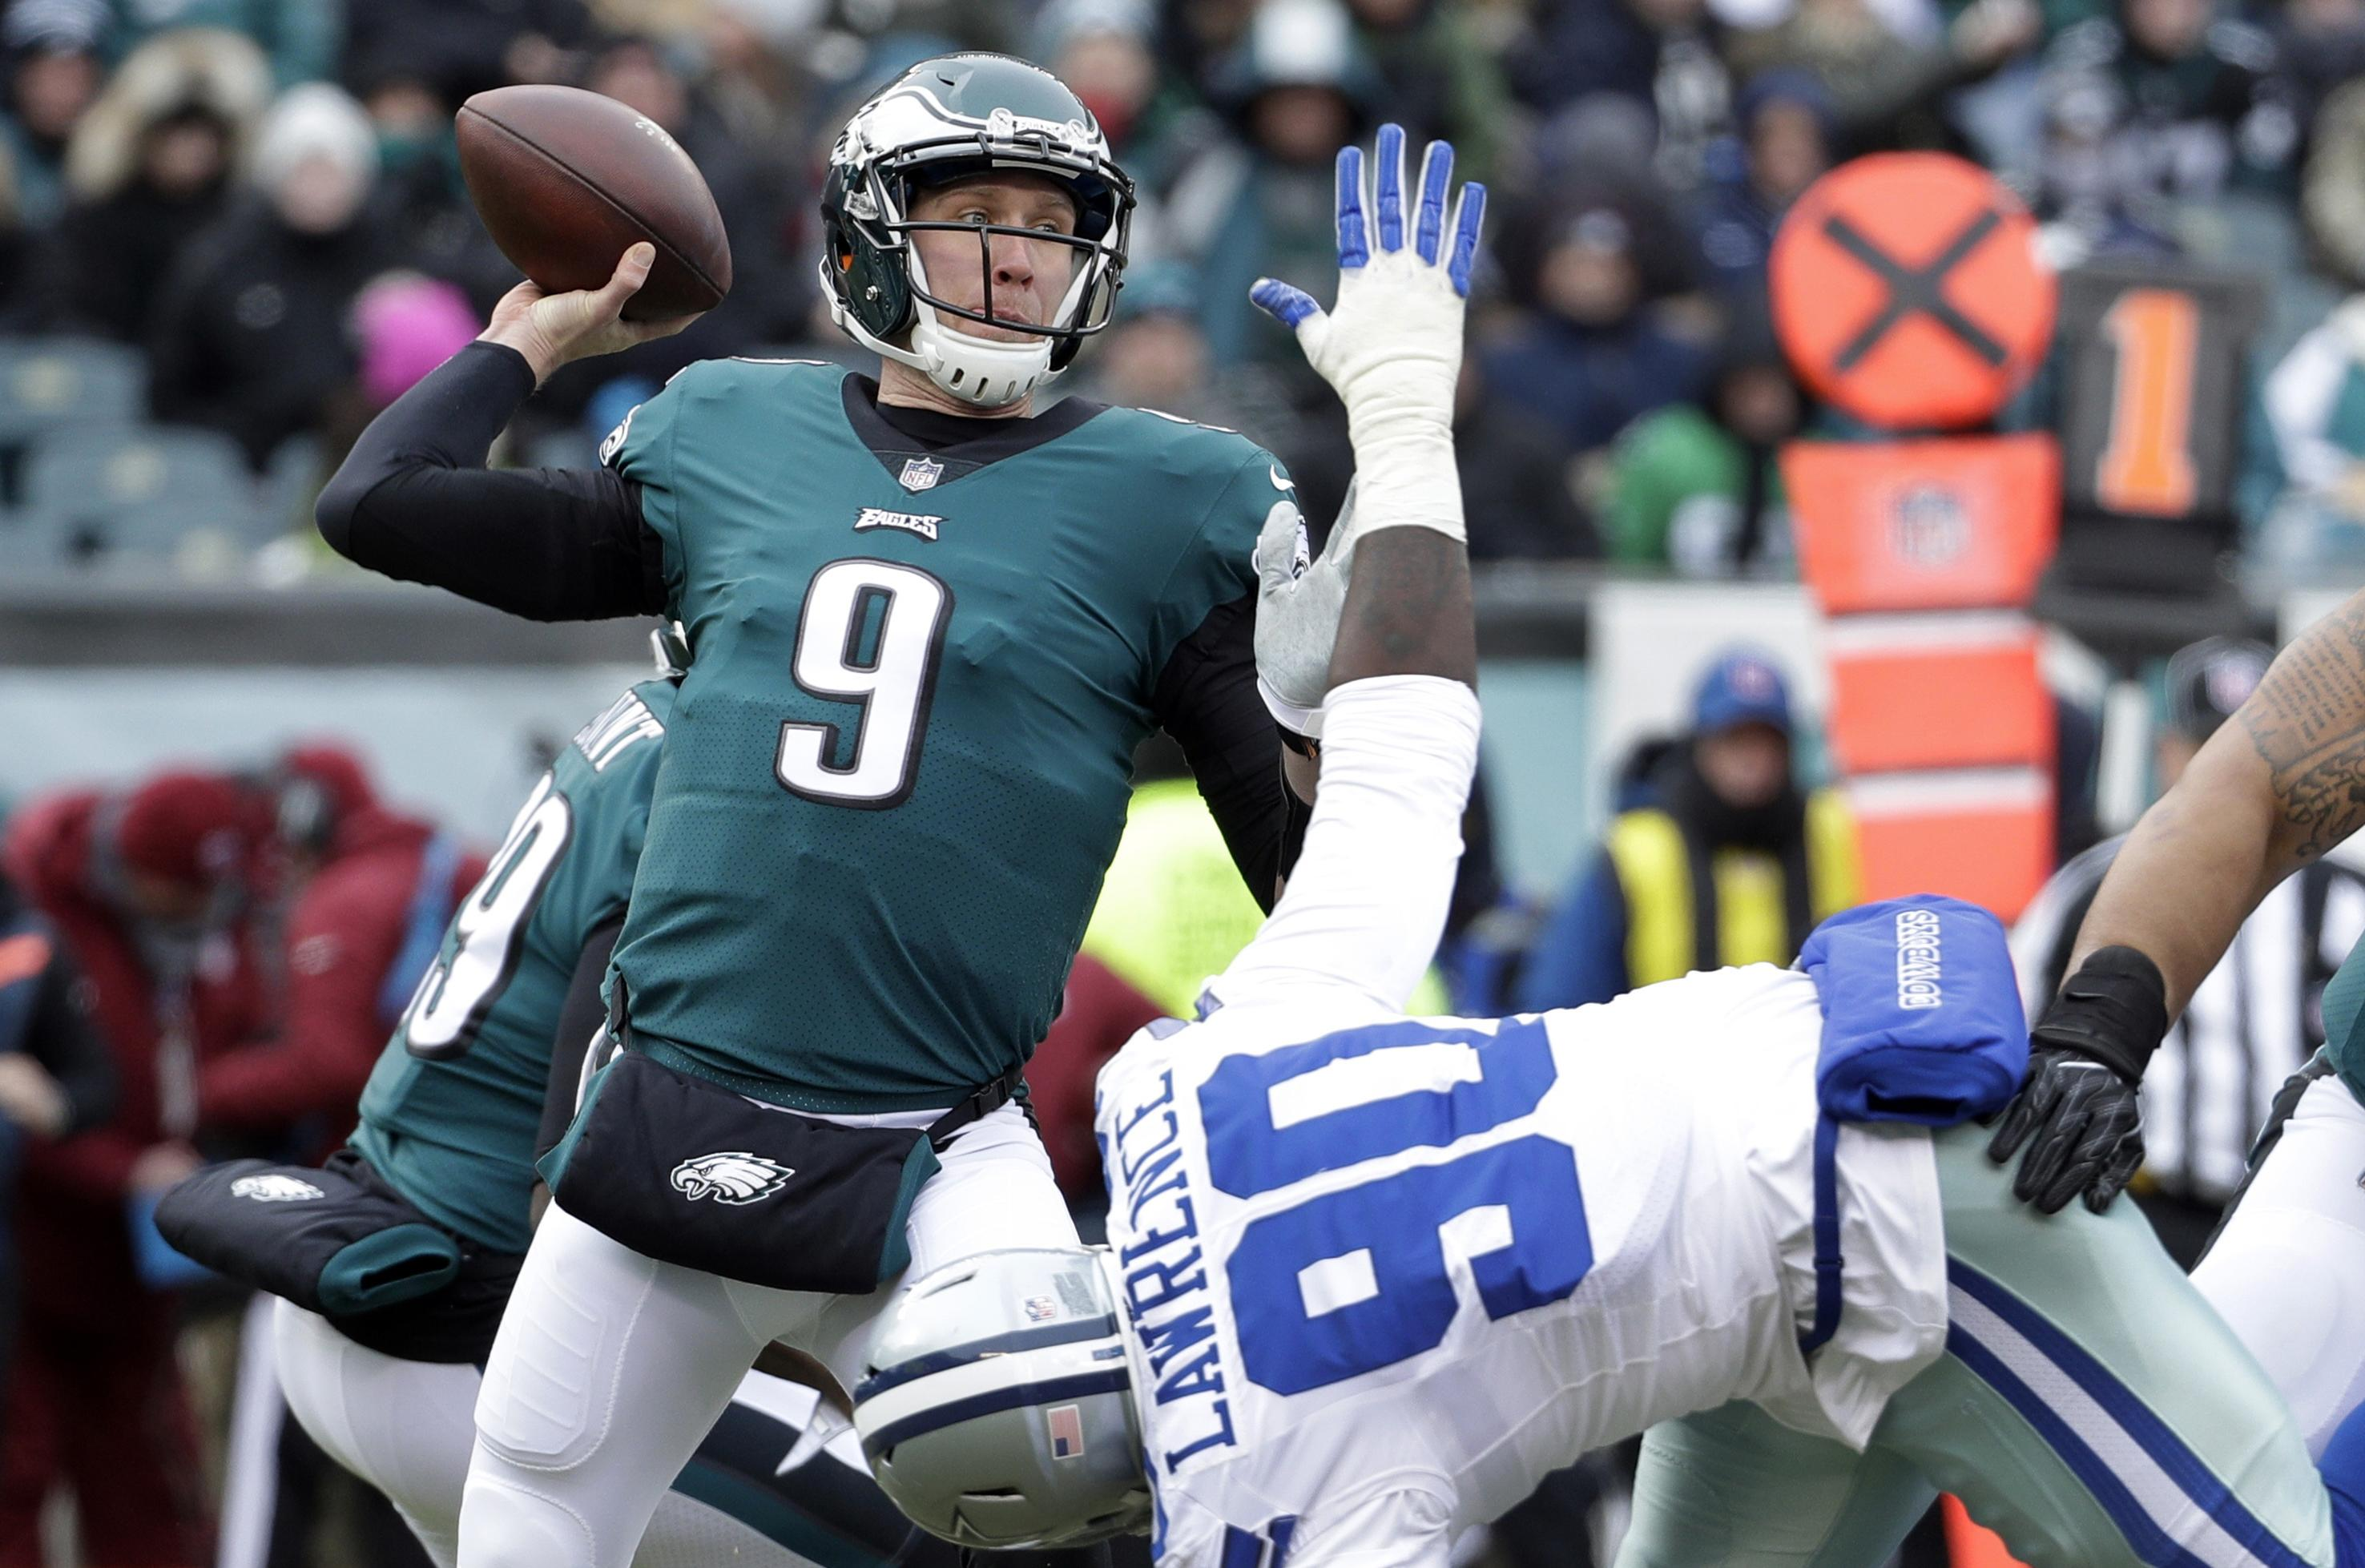 Philadelphia Eagles Quarterback Carson Wentz Throws The Ball During Practice At Nfl Football Training C